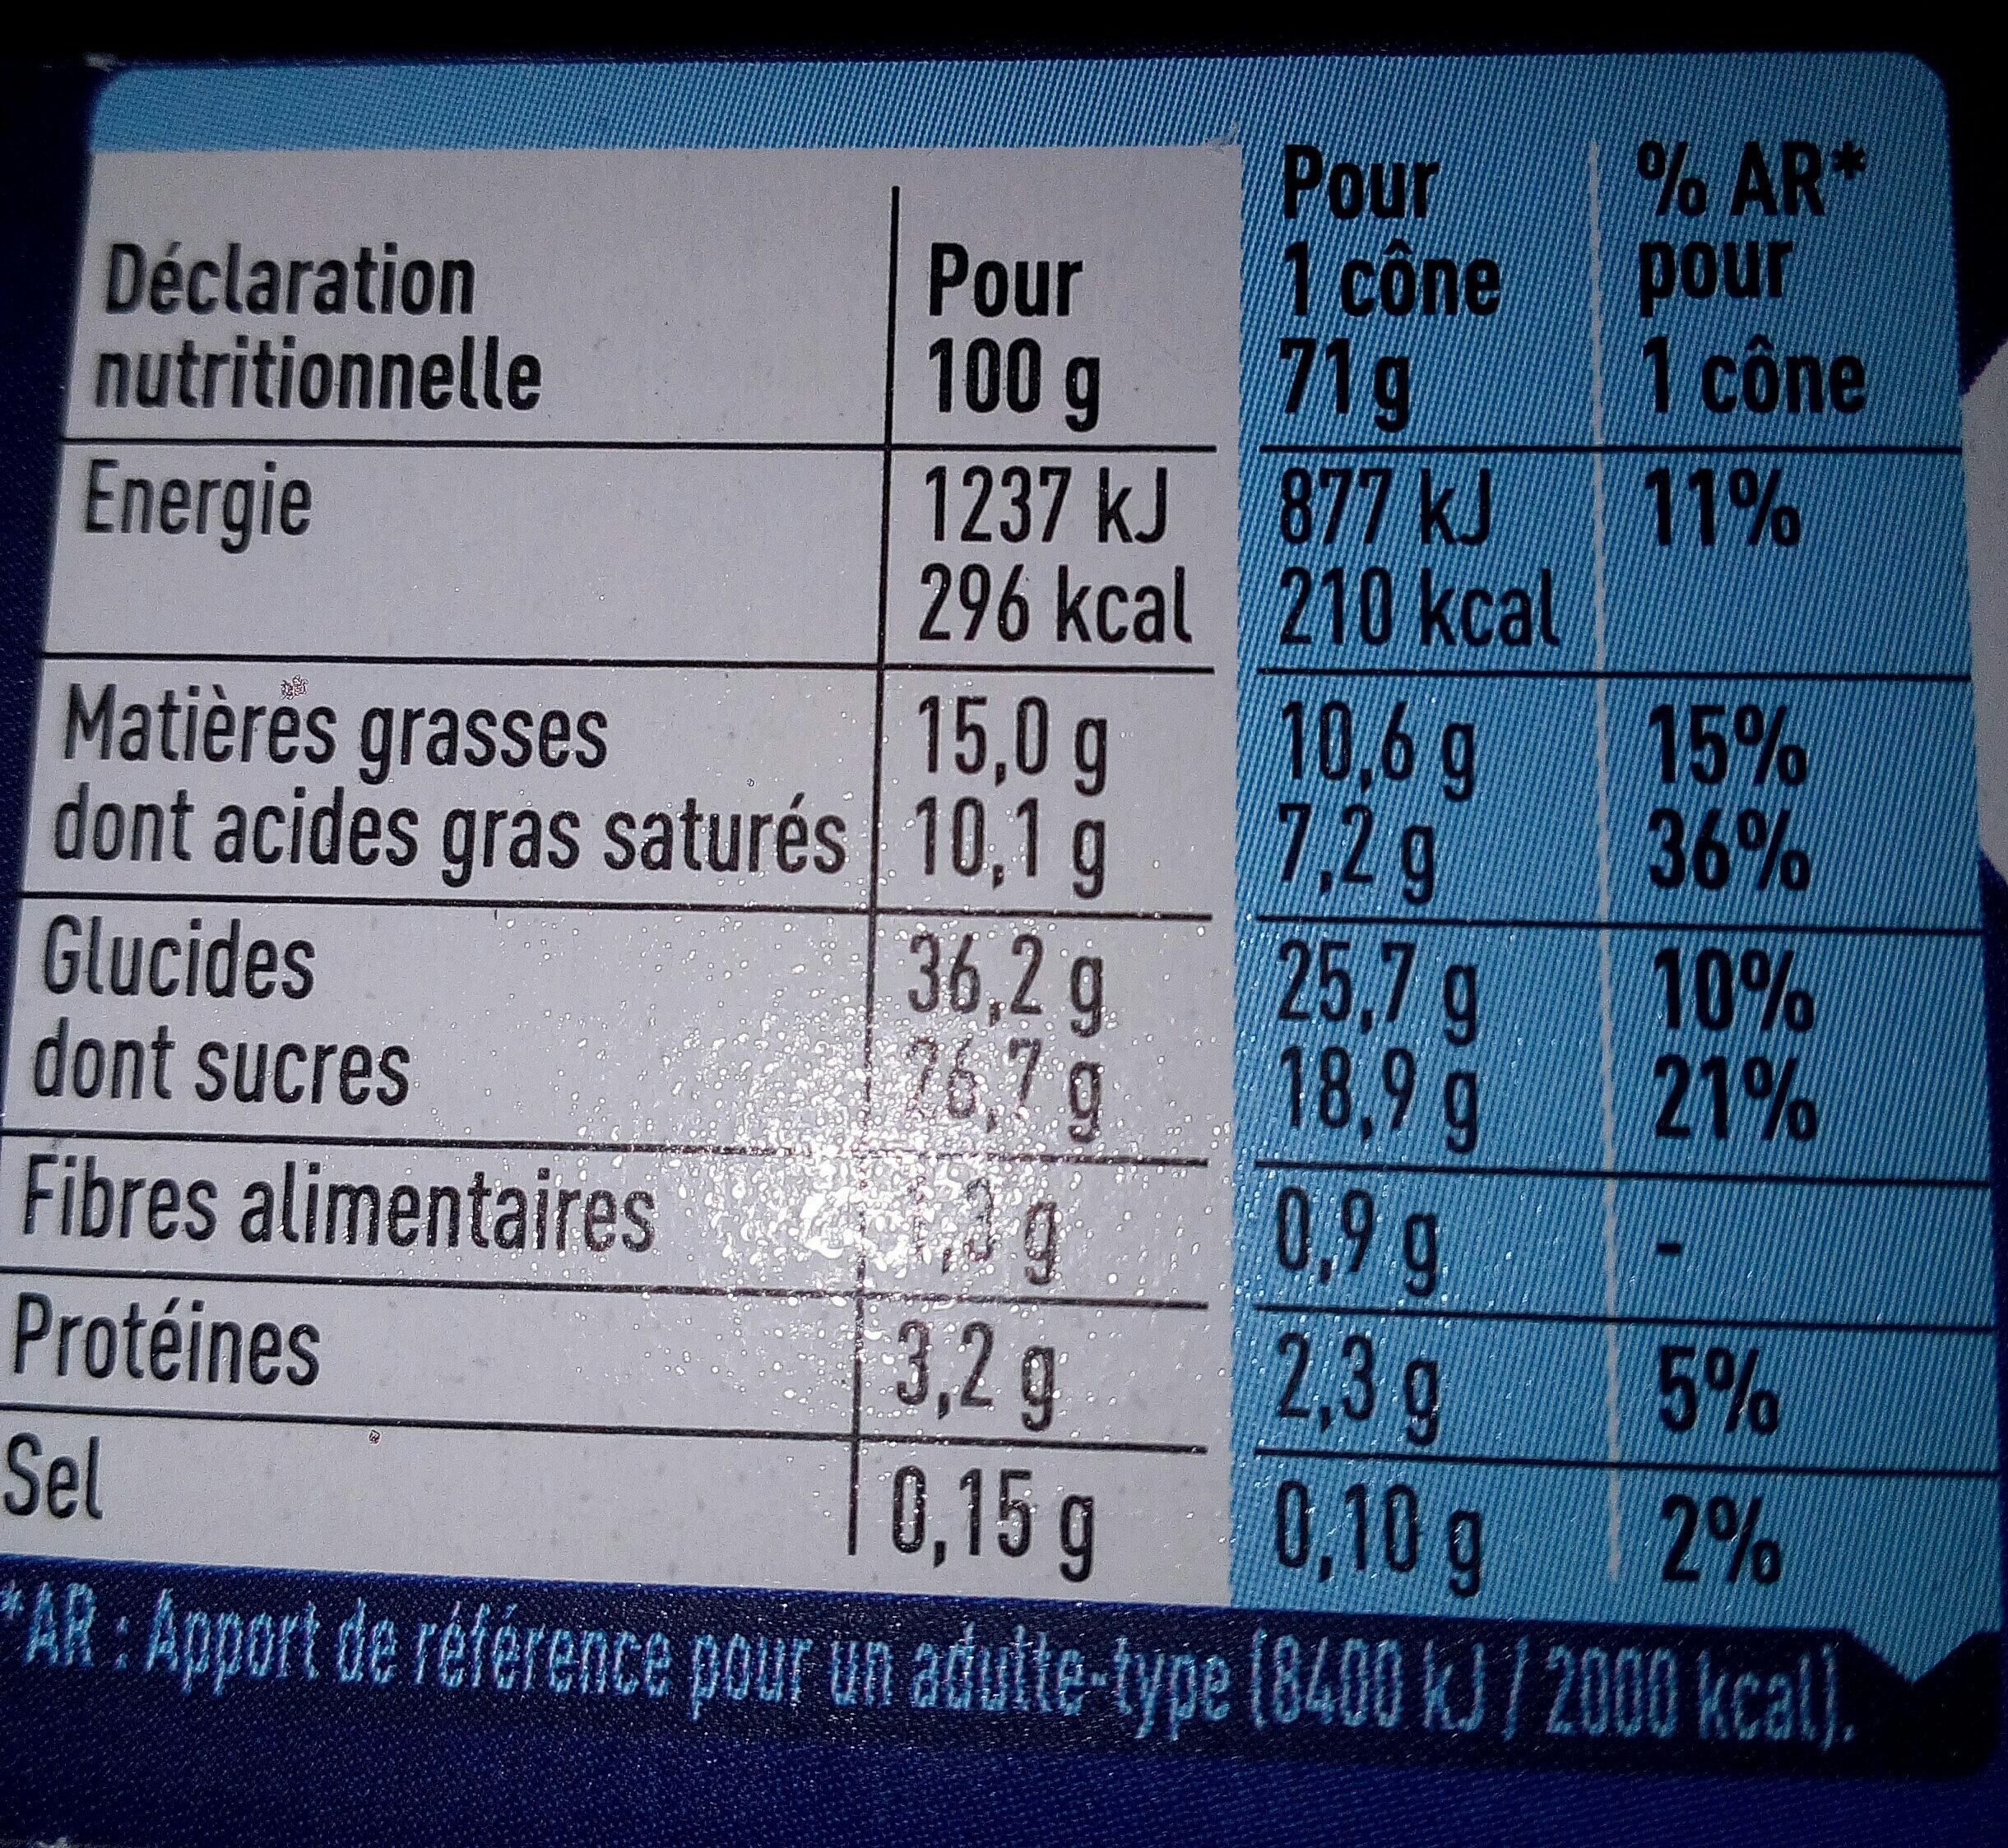 Extrême original vanille pepites de nougatine - Informations nutritionnelles - fr